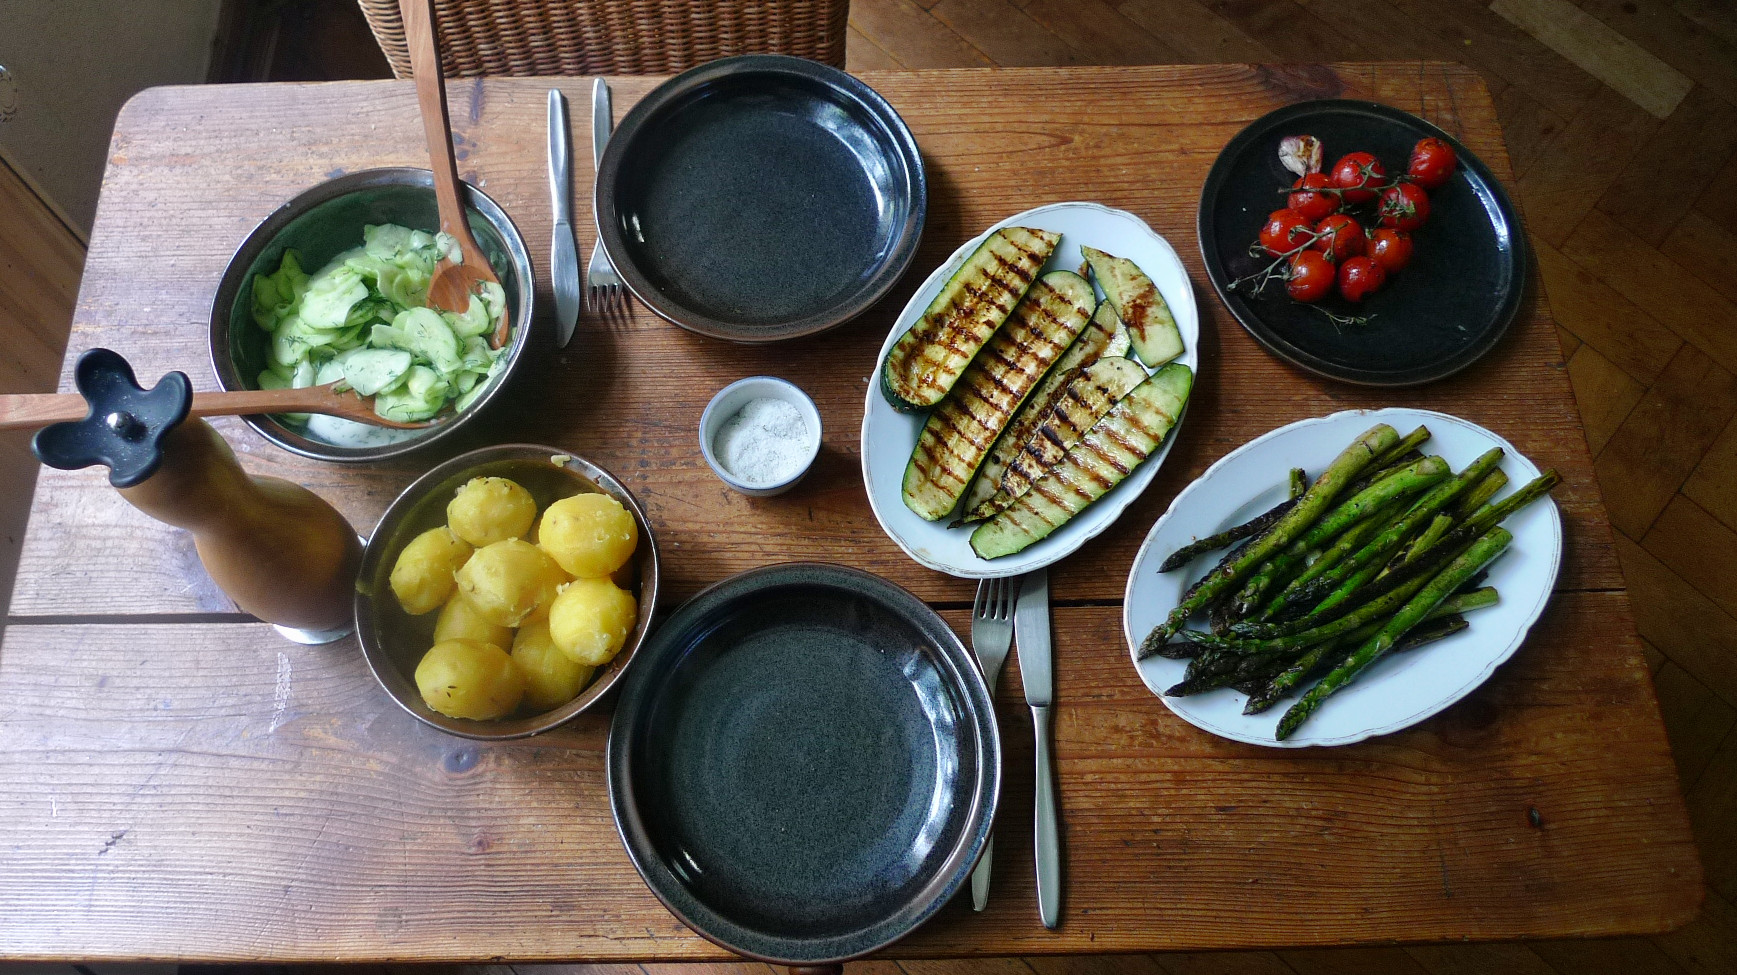 Spargel,Zucchini,Tomate,Gurkensalat,Kartoffeln -3.5.15   (9)